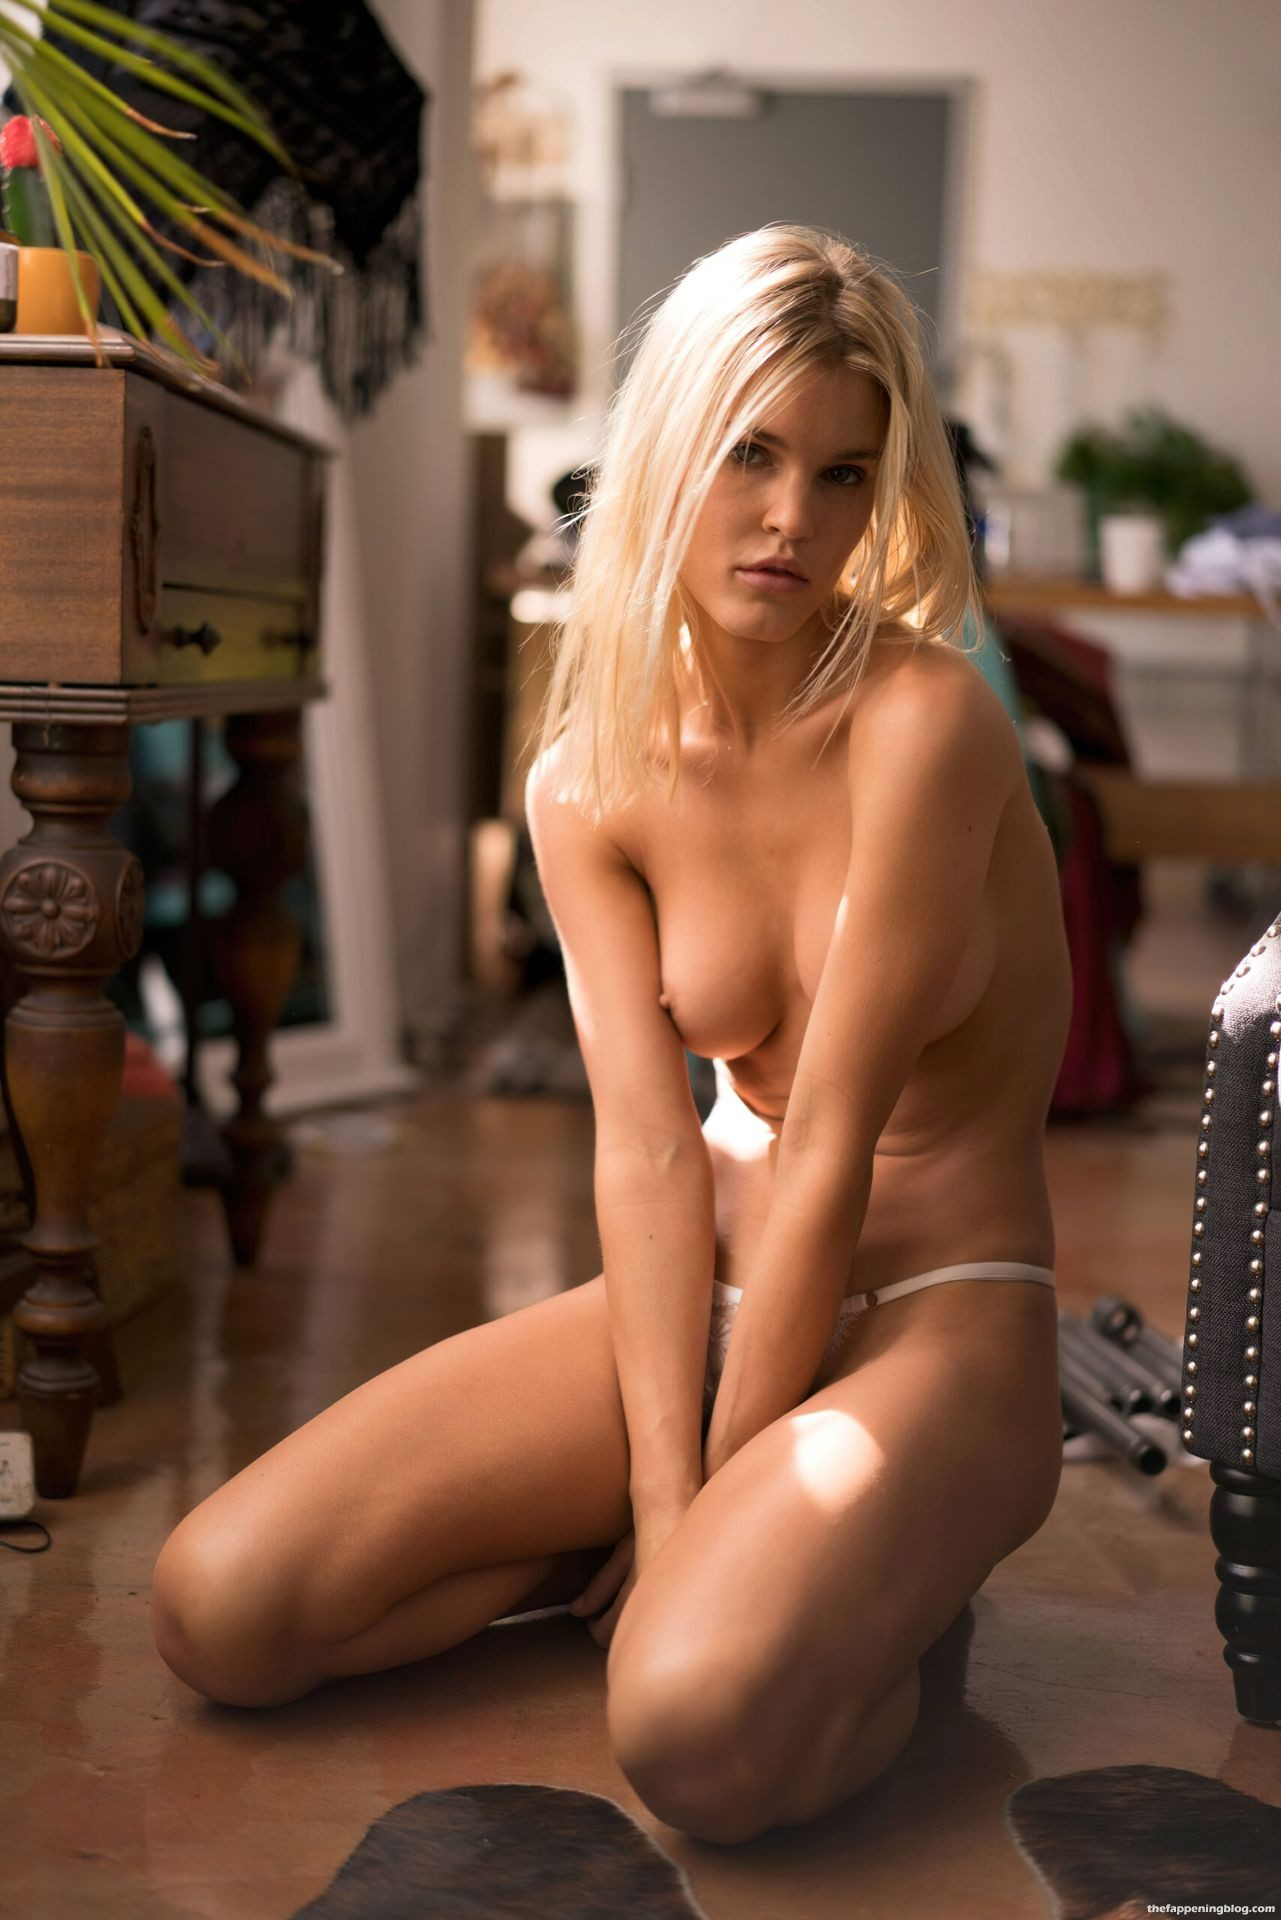 Joy-Corrigan-Naked-Tits-and-Ass-2-1-scaled1-thefappeningblog.com_.jpg